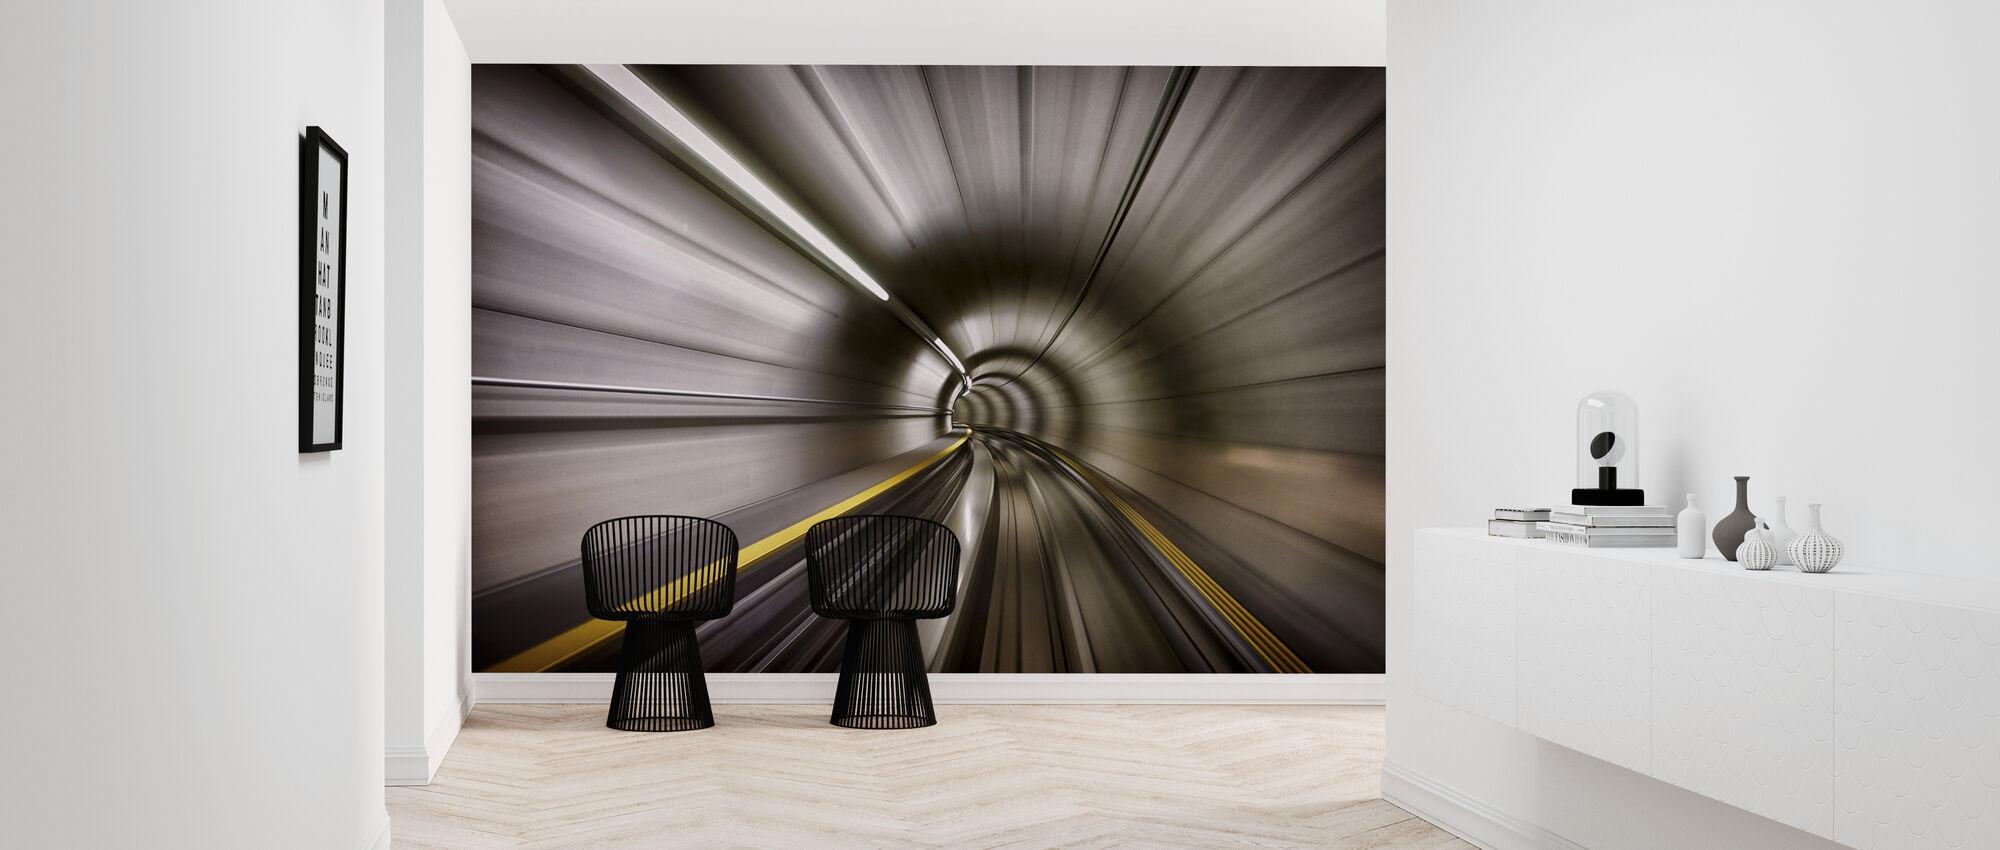 Tunnelen - Tapet - Entré